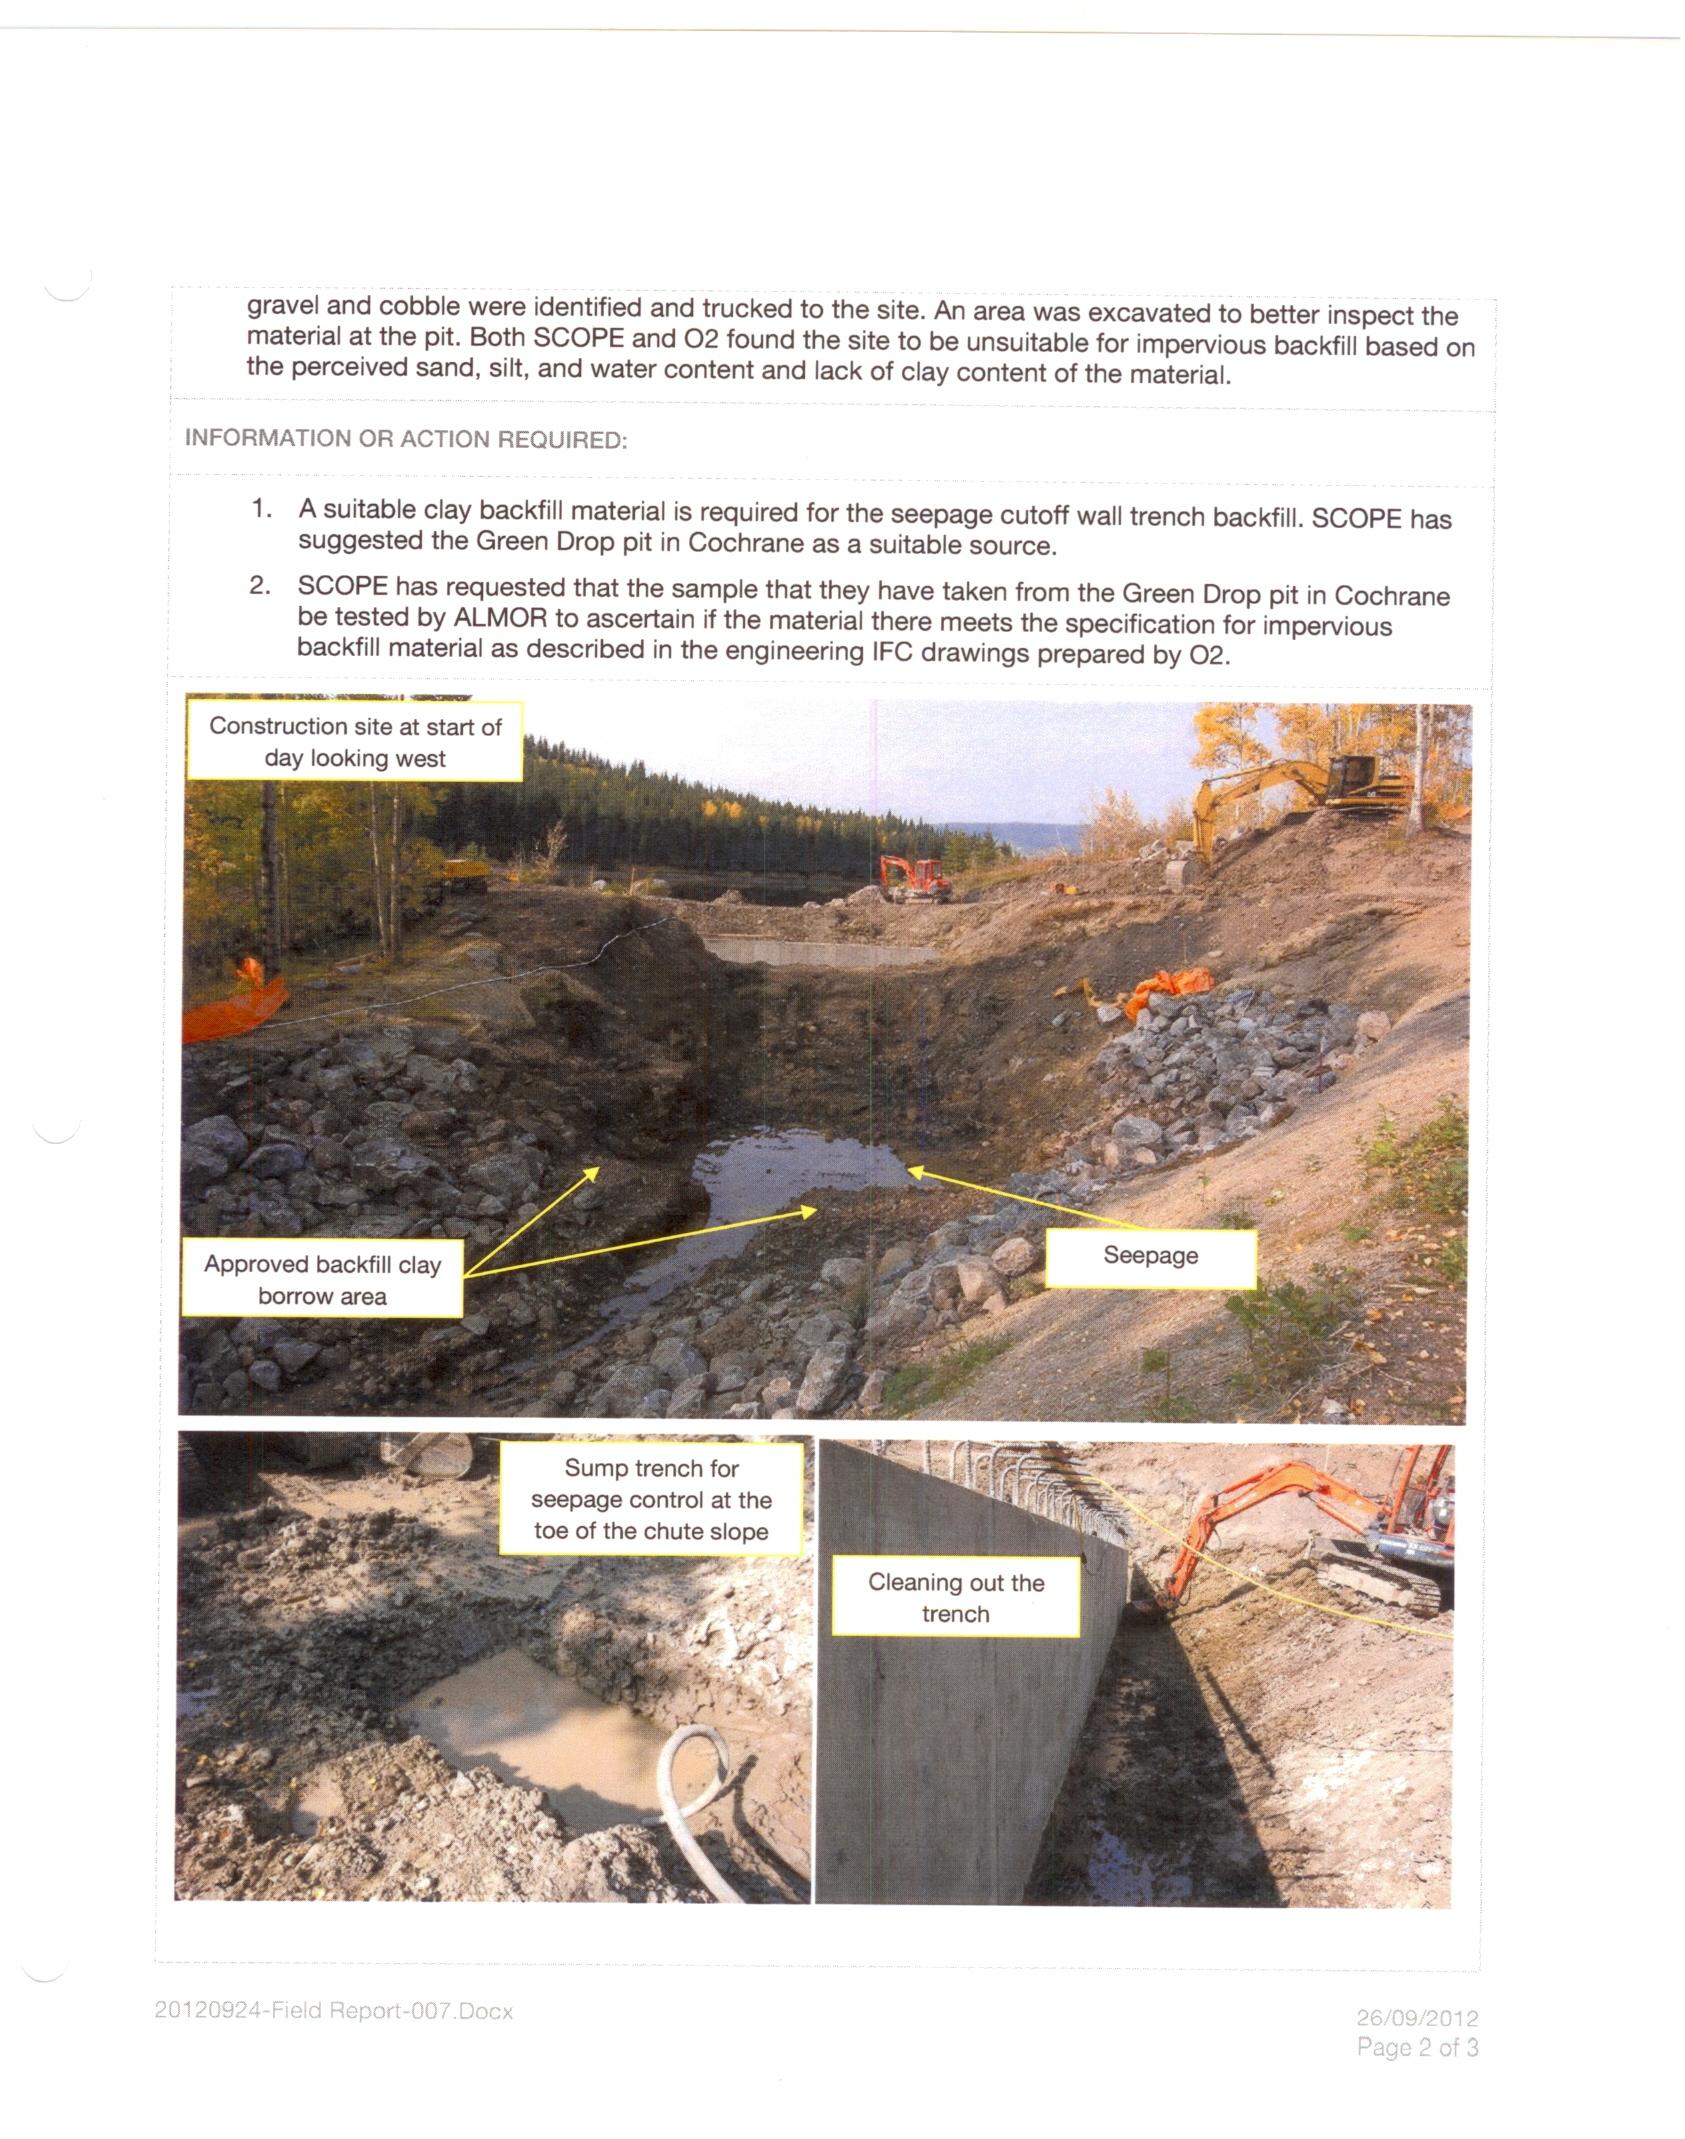 field report pic1.jpg